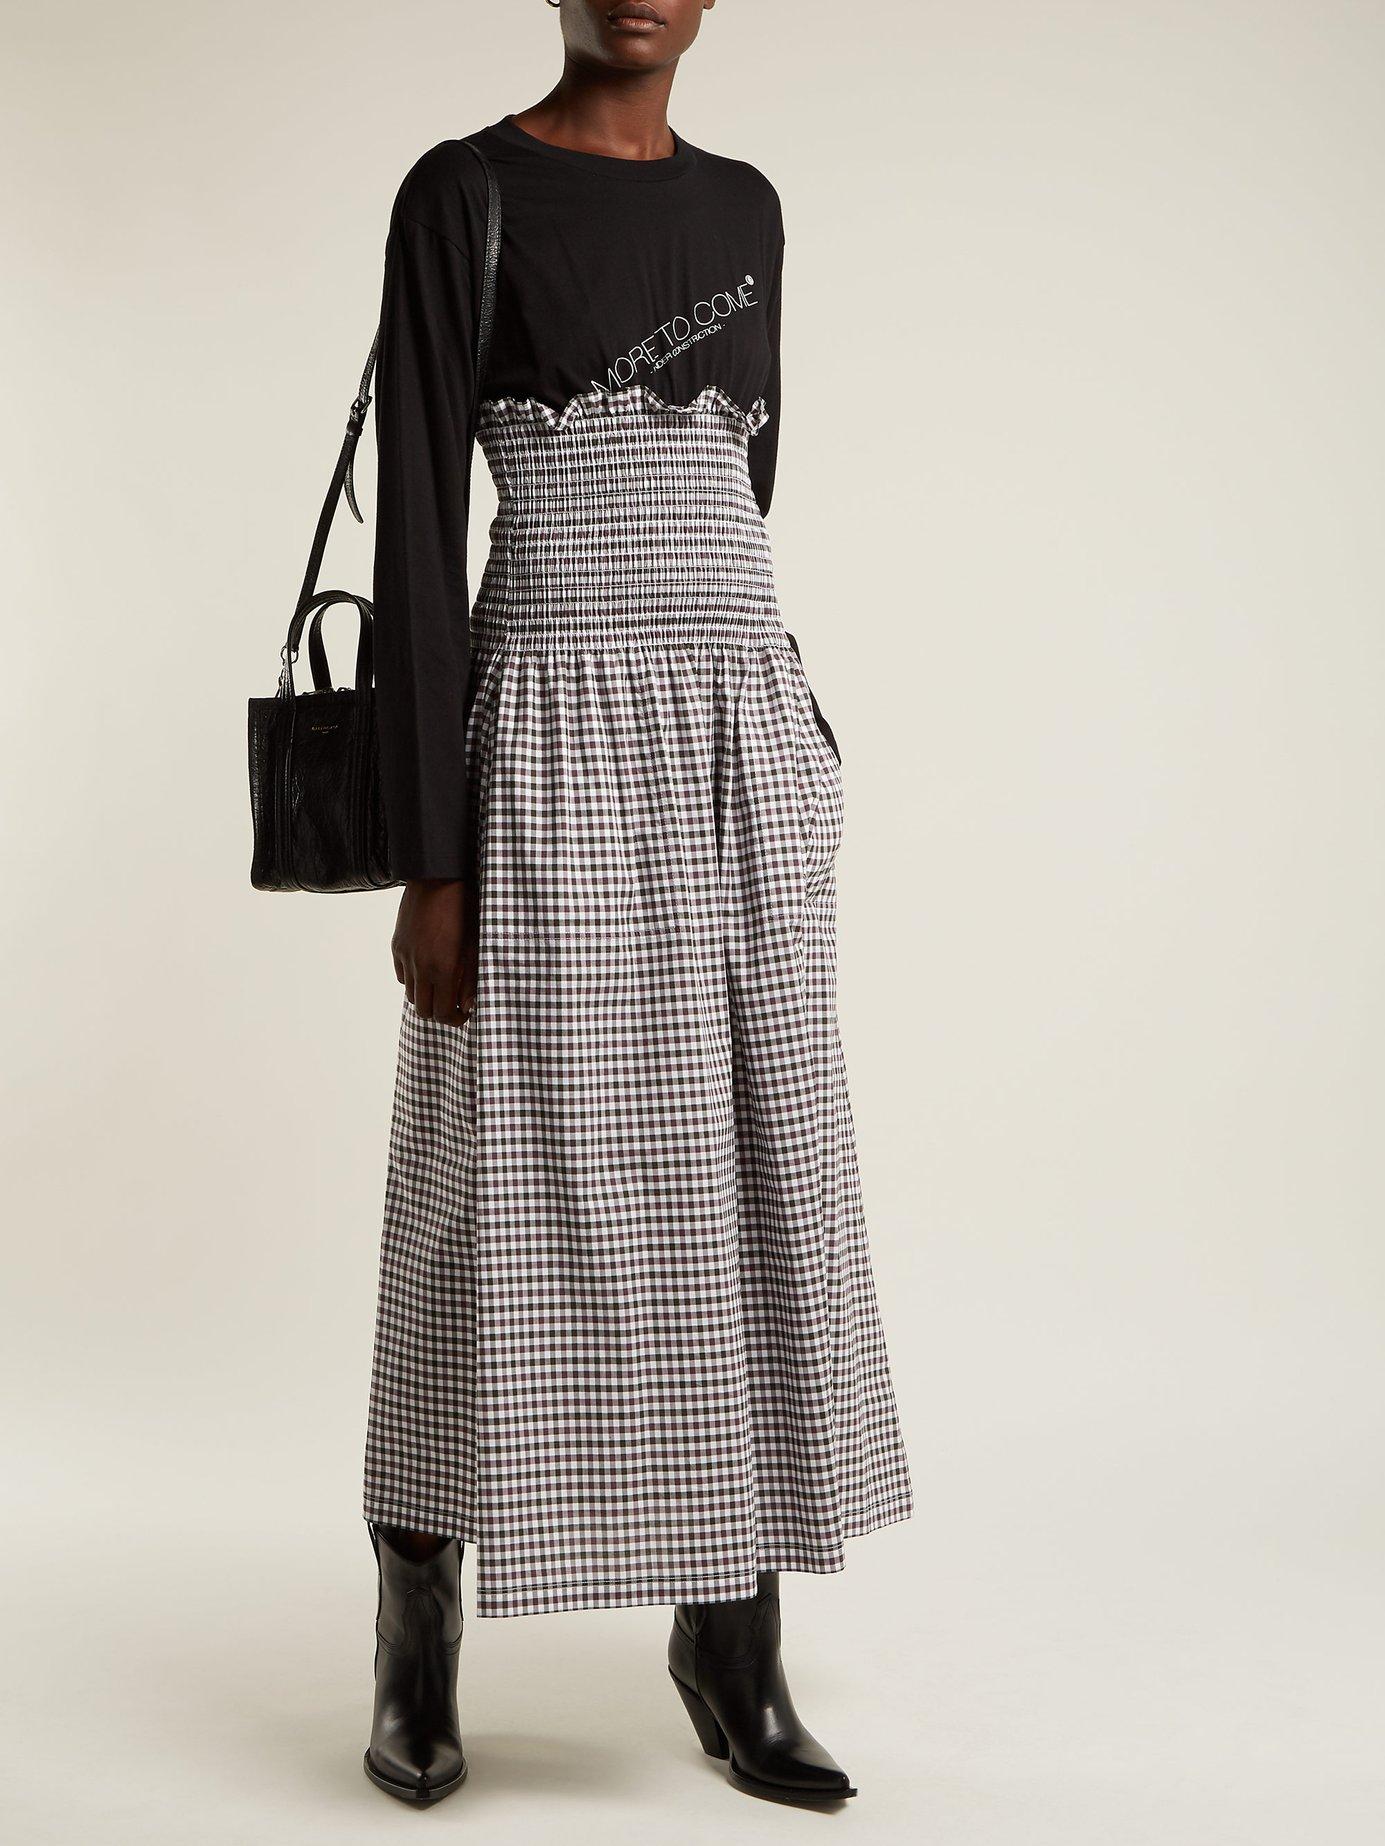 Contrast-panel gingham cotton dress by Mm6 Maison Margiela